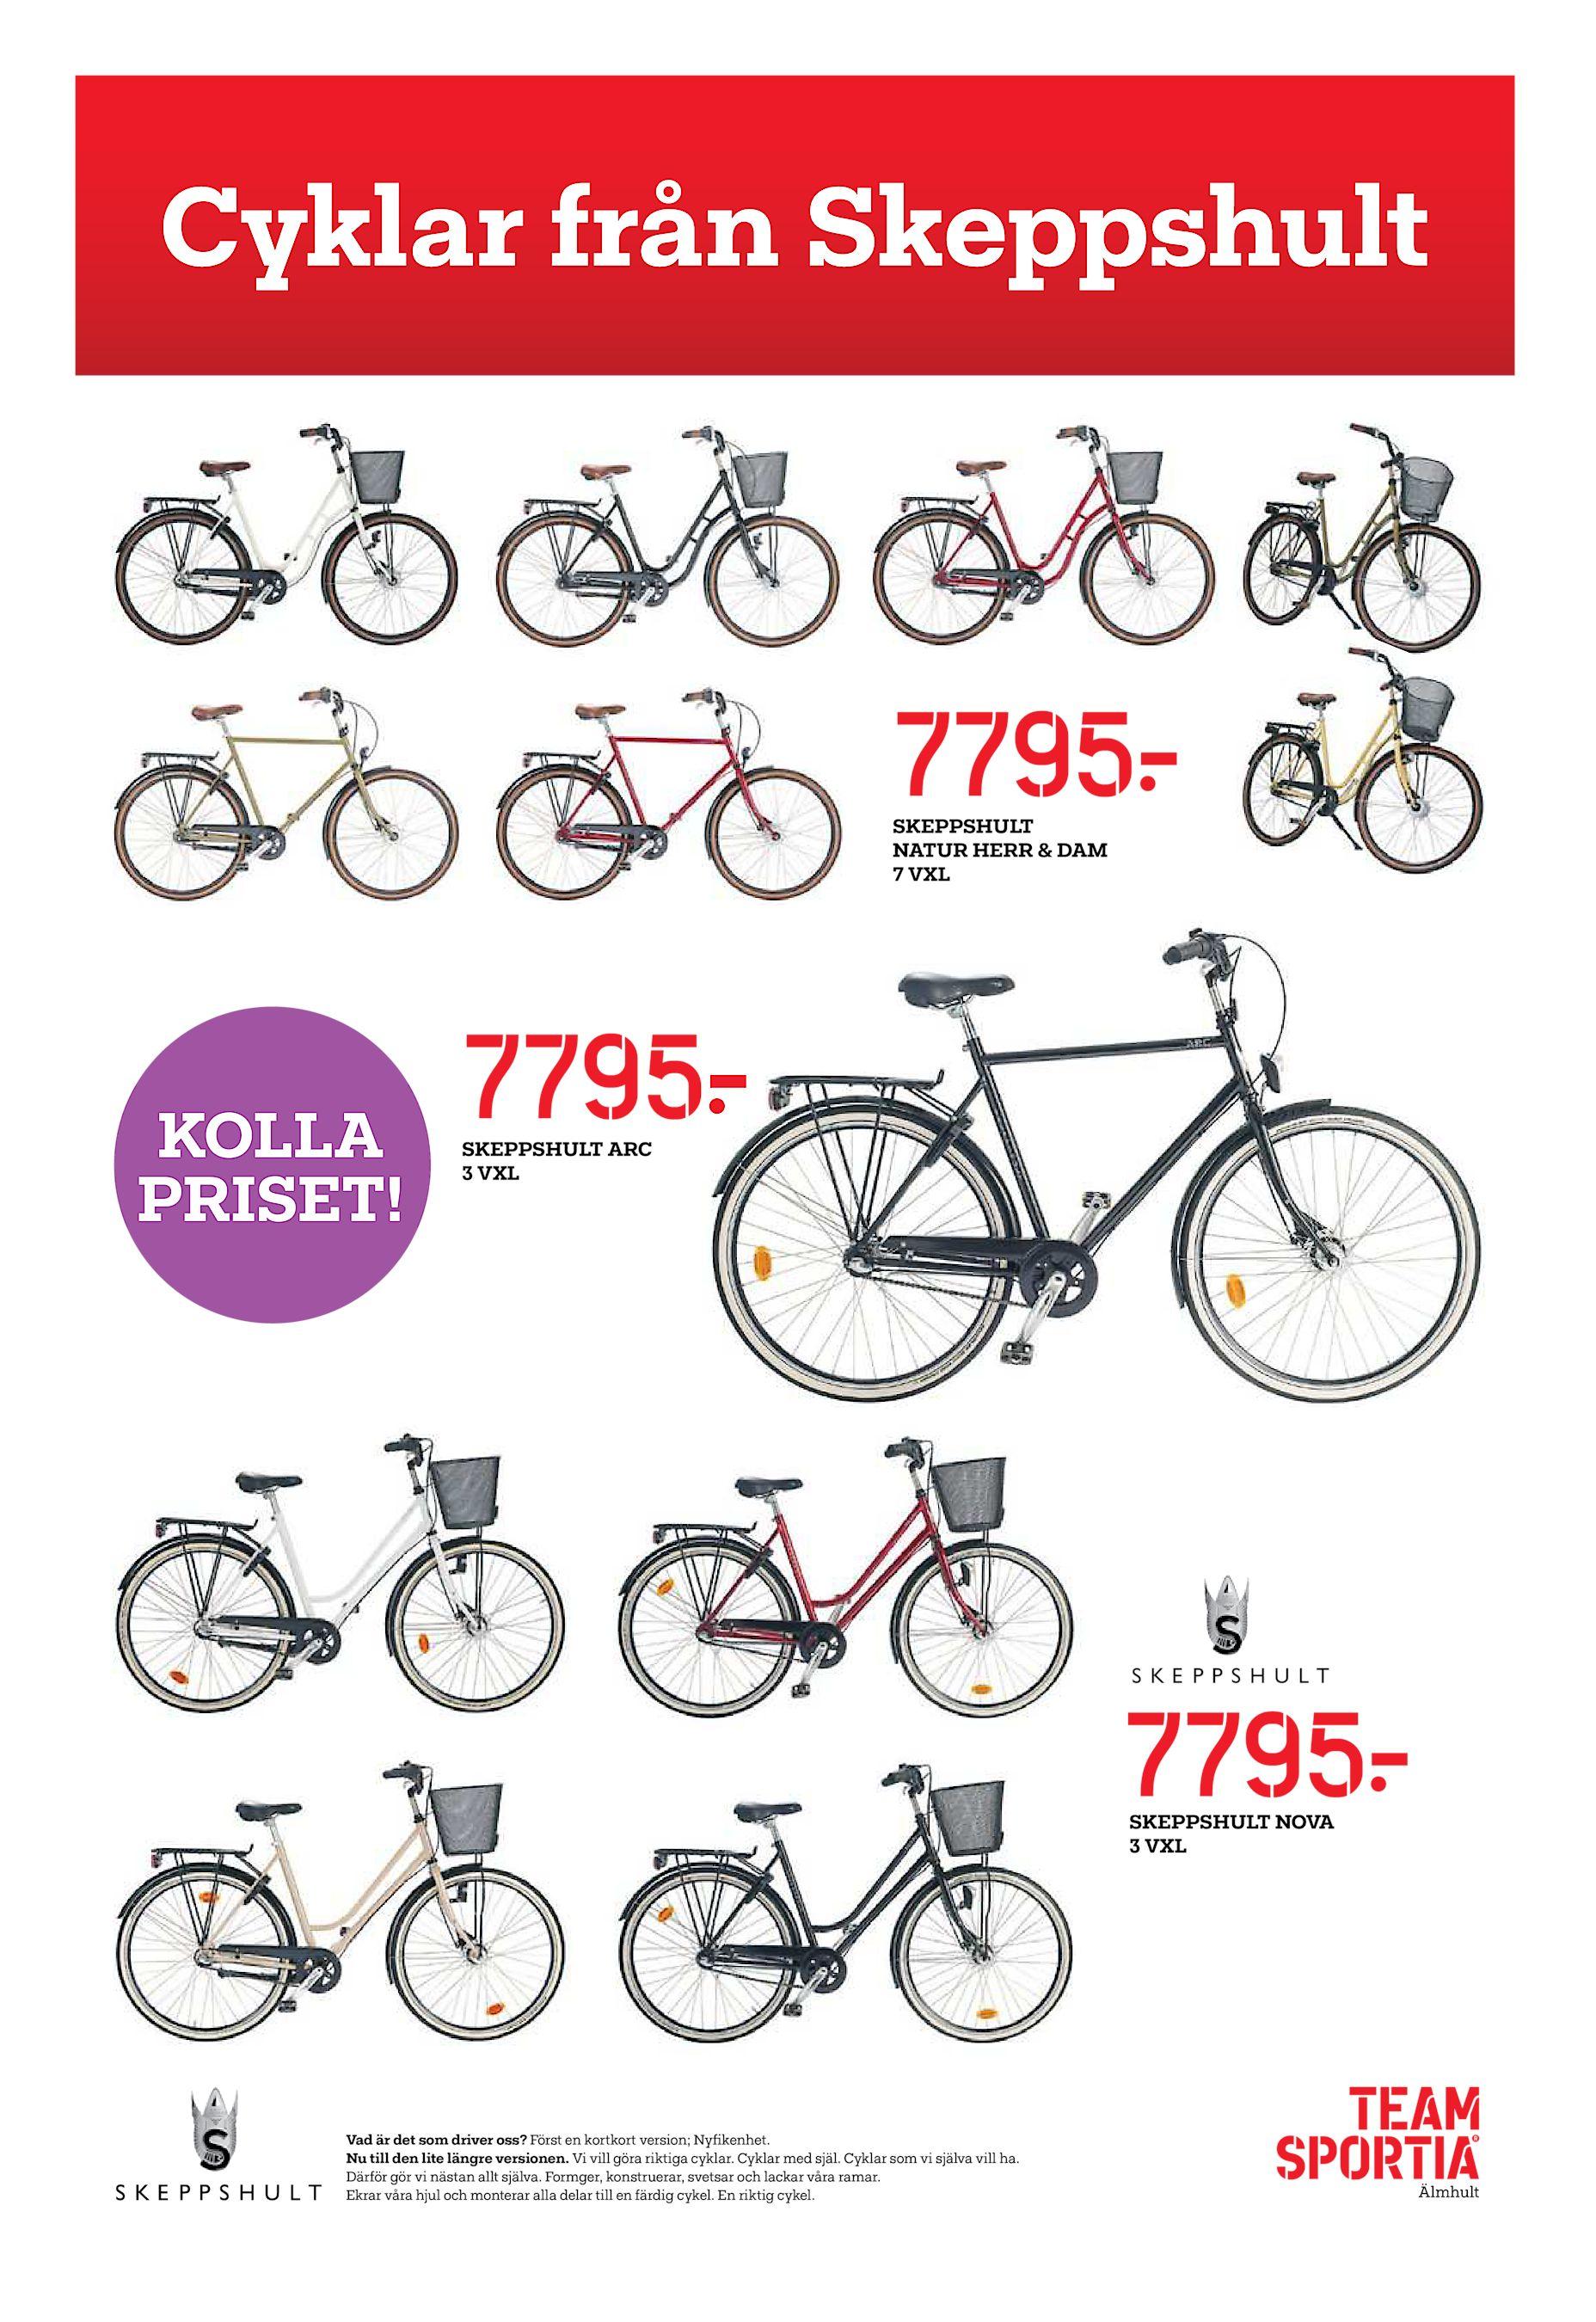 timeless design 5a703 b7291 Cyklar från Skeppshult 7795  SKEPPSHULT NATUR HERR   DAM 7 VXL KOLLA  PRISET! 7795  SKEPPSHULT ARC 3 VXL 7795  SKEPPSHULT NOVA 3 VXL Vad är det  som driver ...